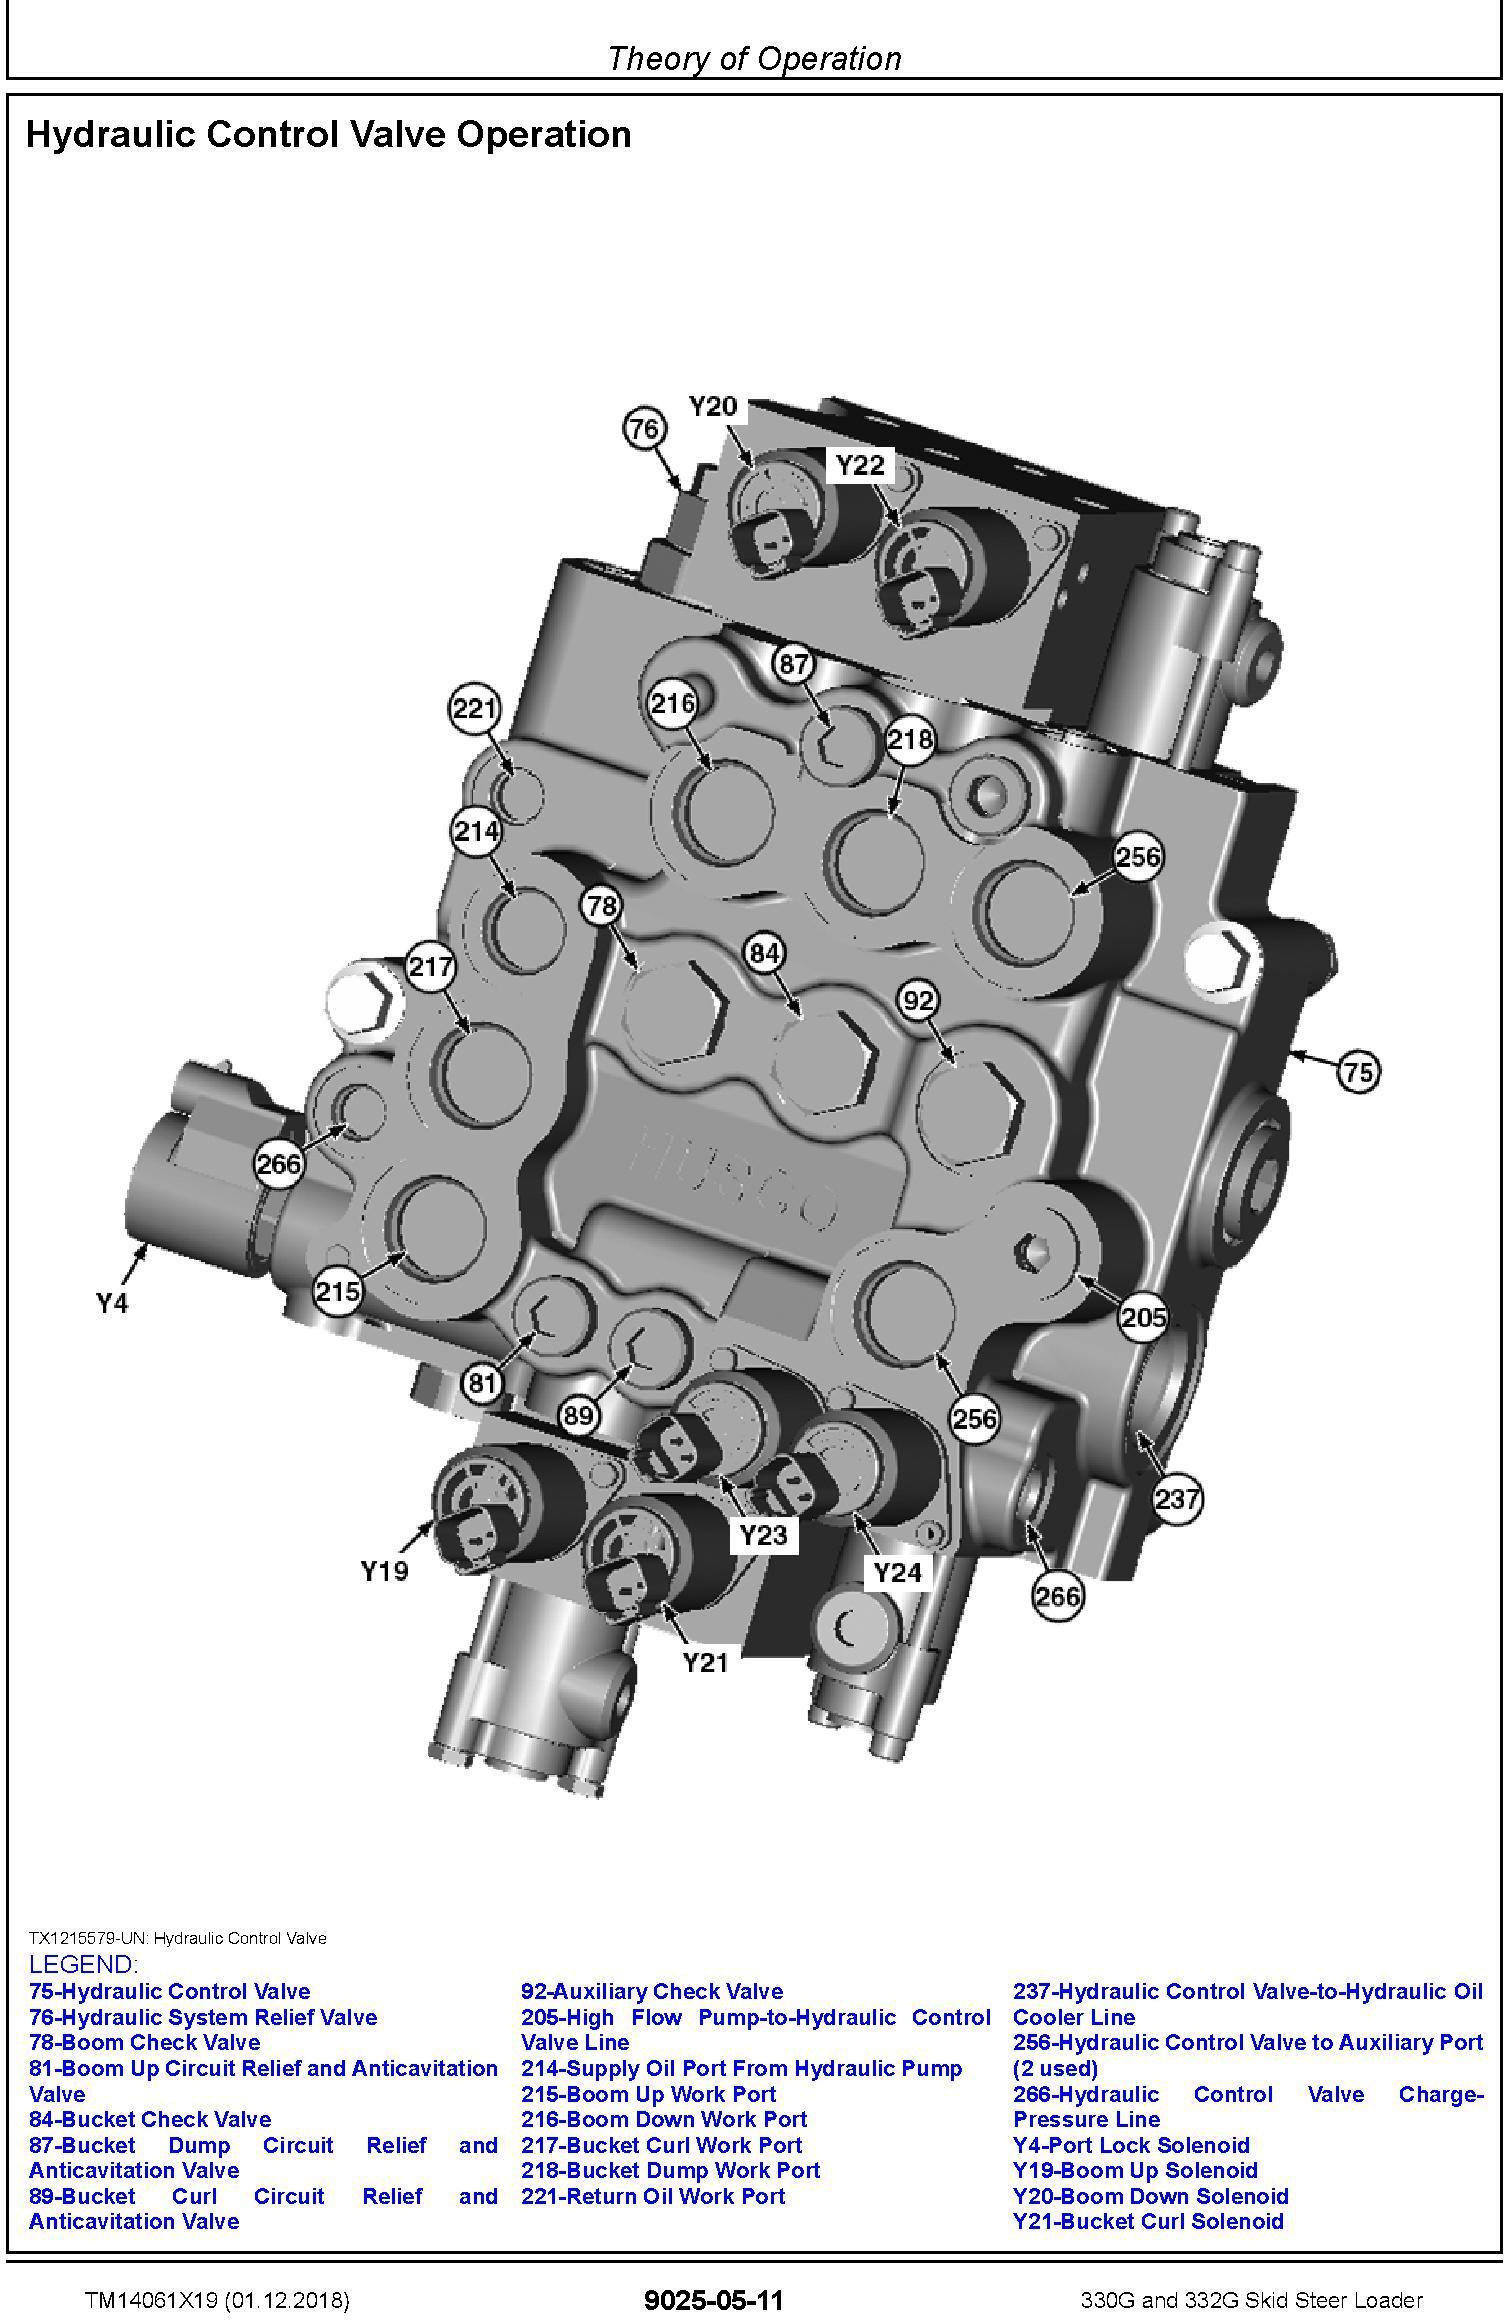 John Deere 330G and 332G Skid Steer Loader Operation & Test Technical Service Manual (TM14061X19) - 3